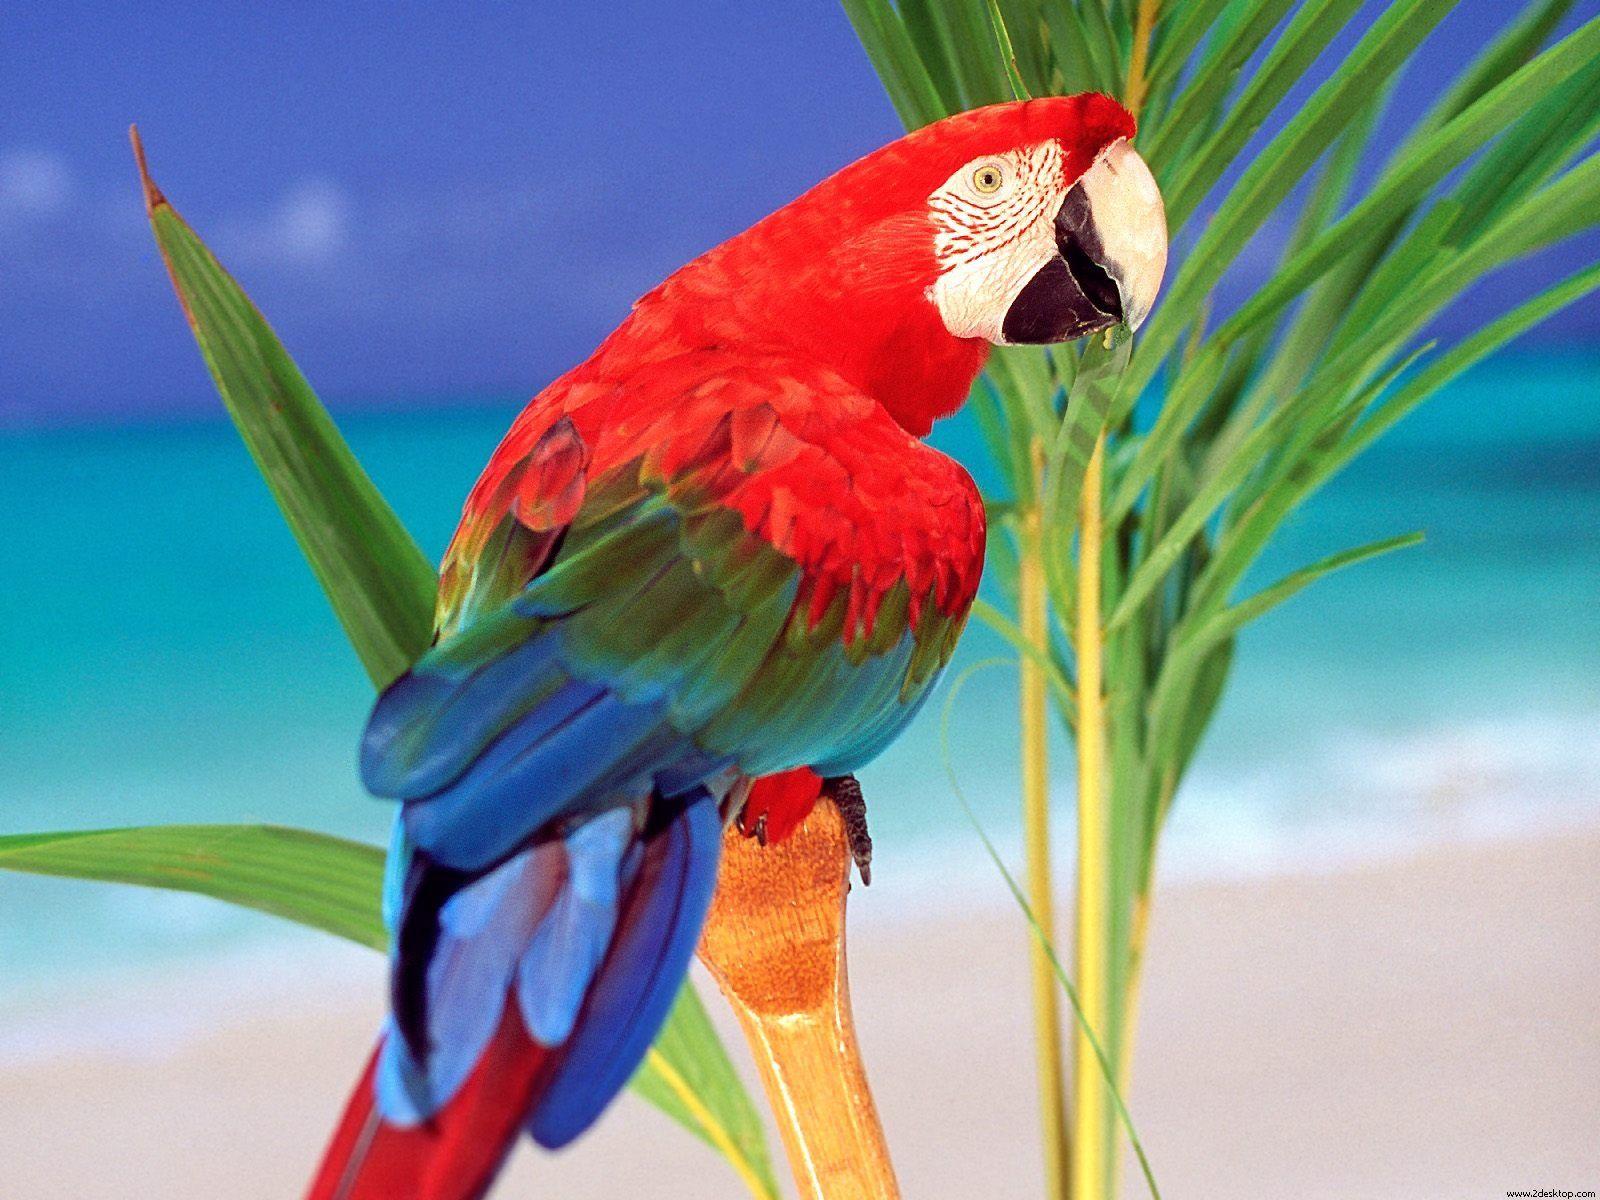 Parrot Parrot Background Wallpaper Animal Wallpapers birds 1600x1200